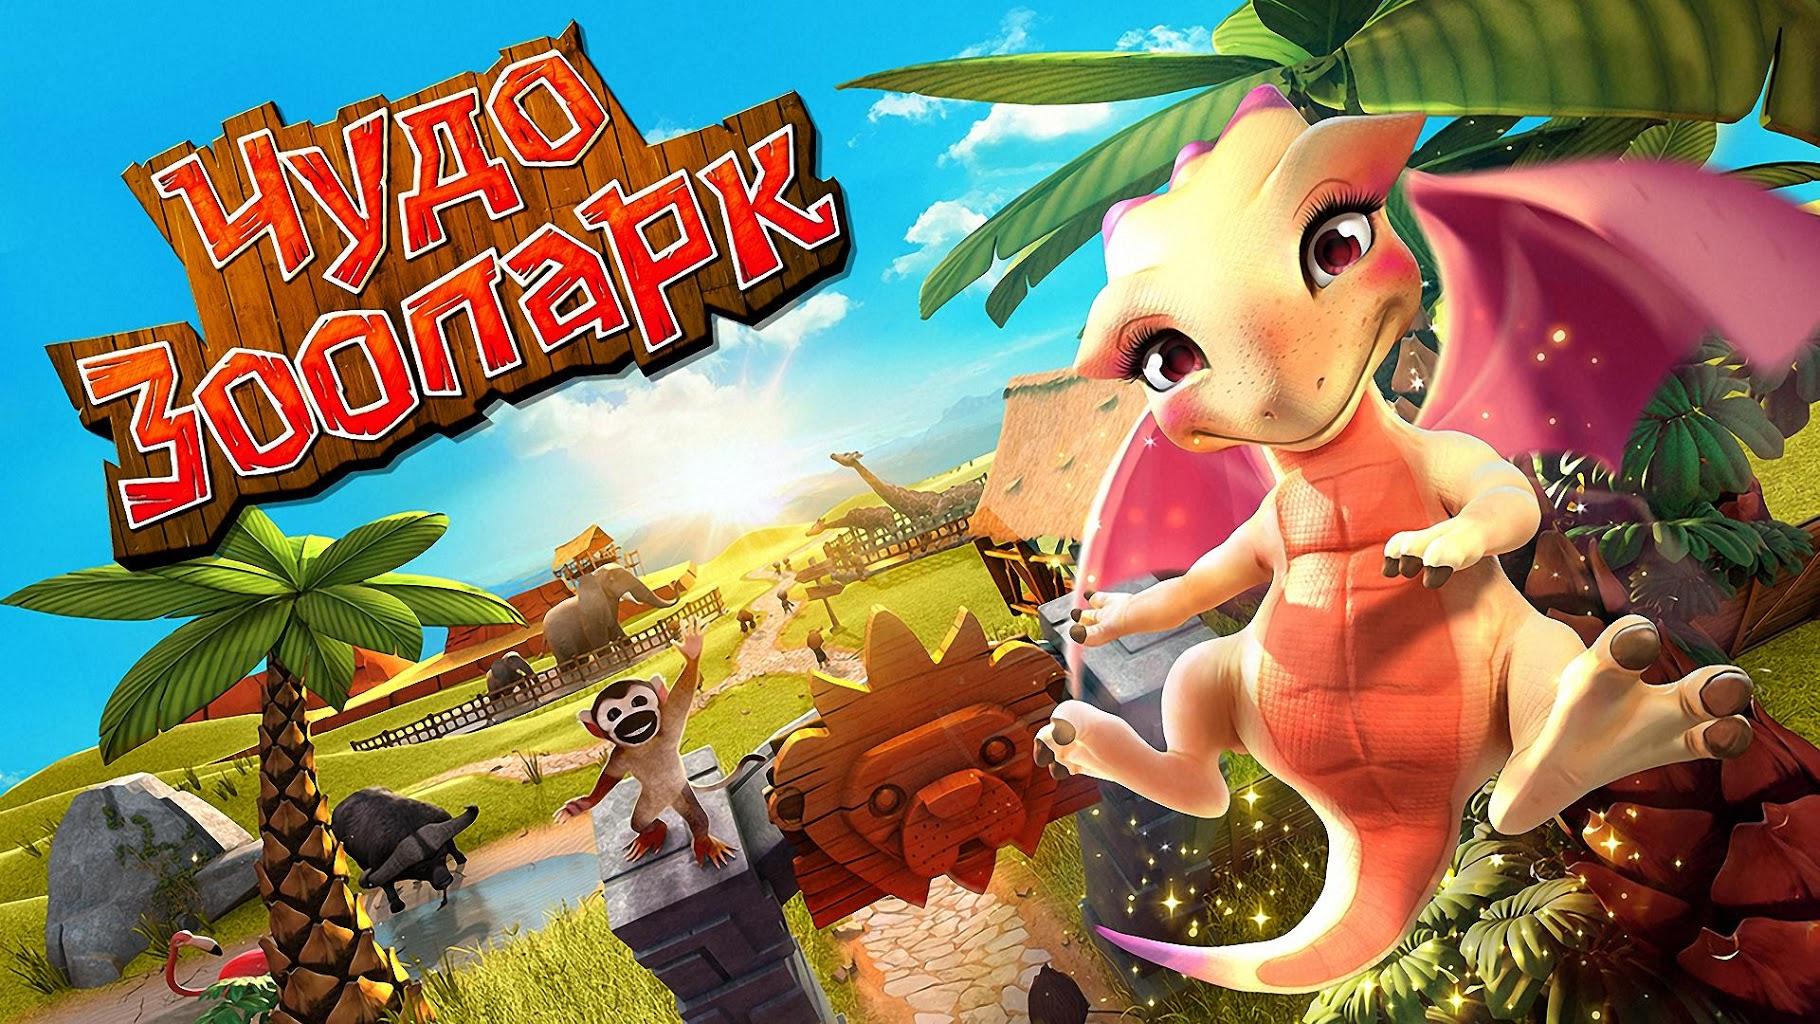 Download Wonder Zoo - Animal rescue 2.1.1a APK (MOD money